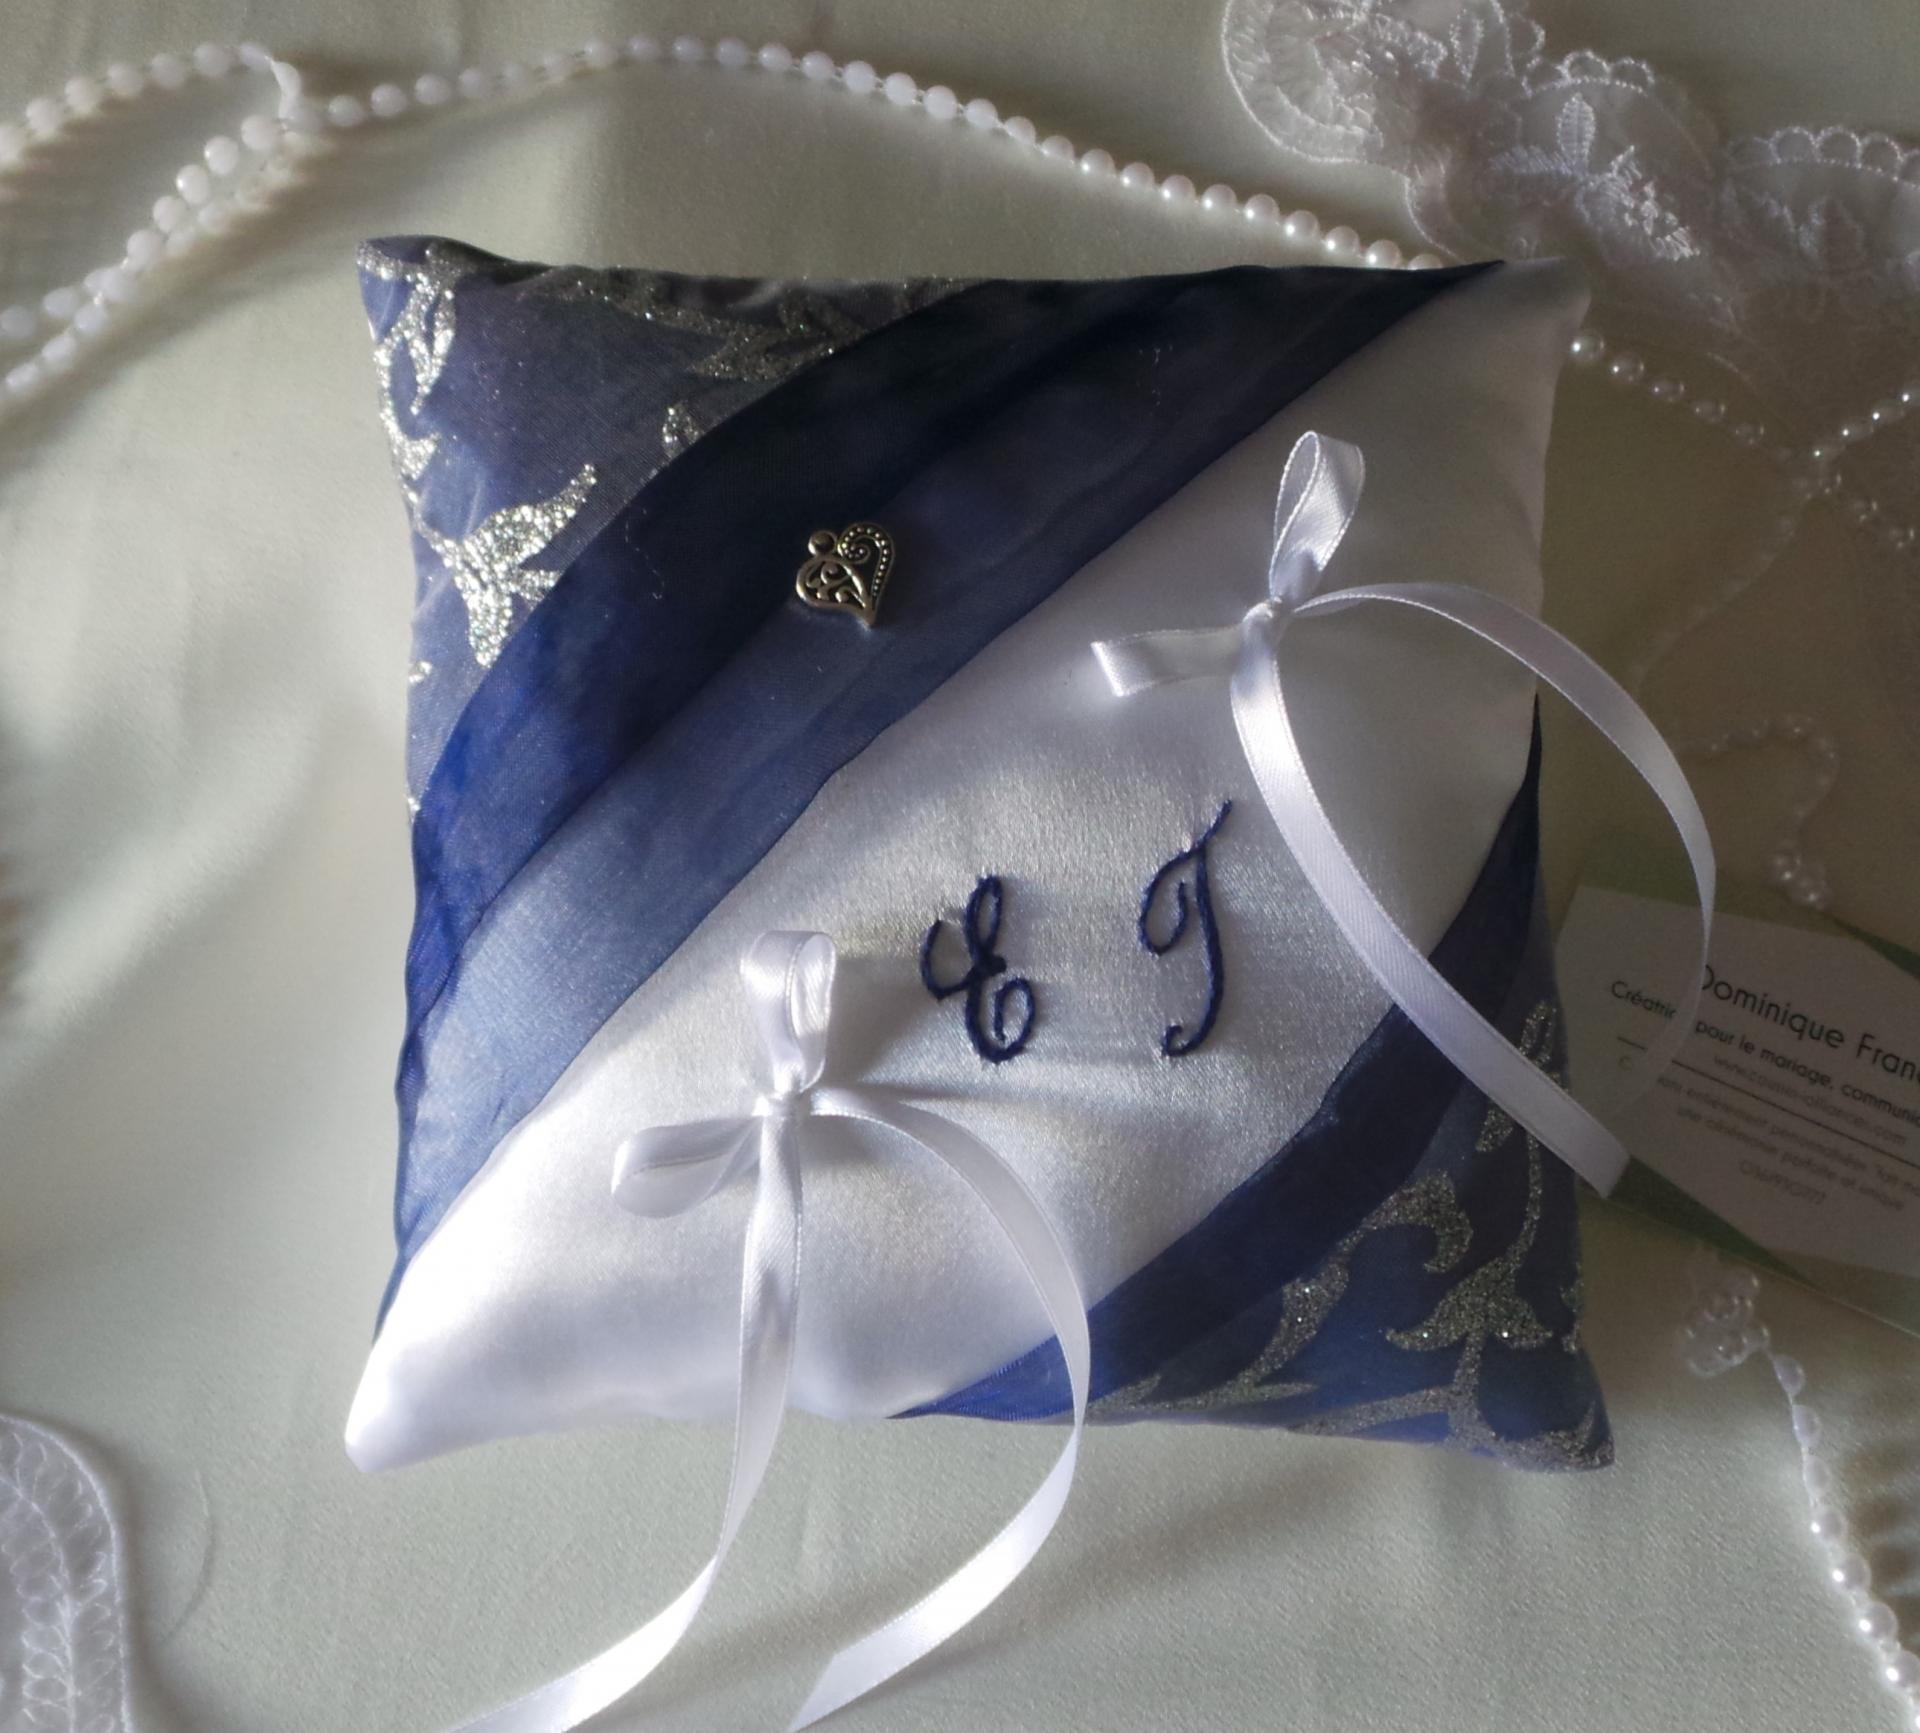 Coussin mariage chic bleu marine argent